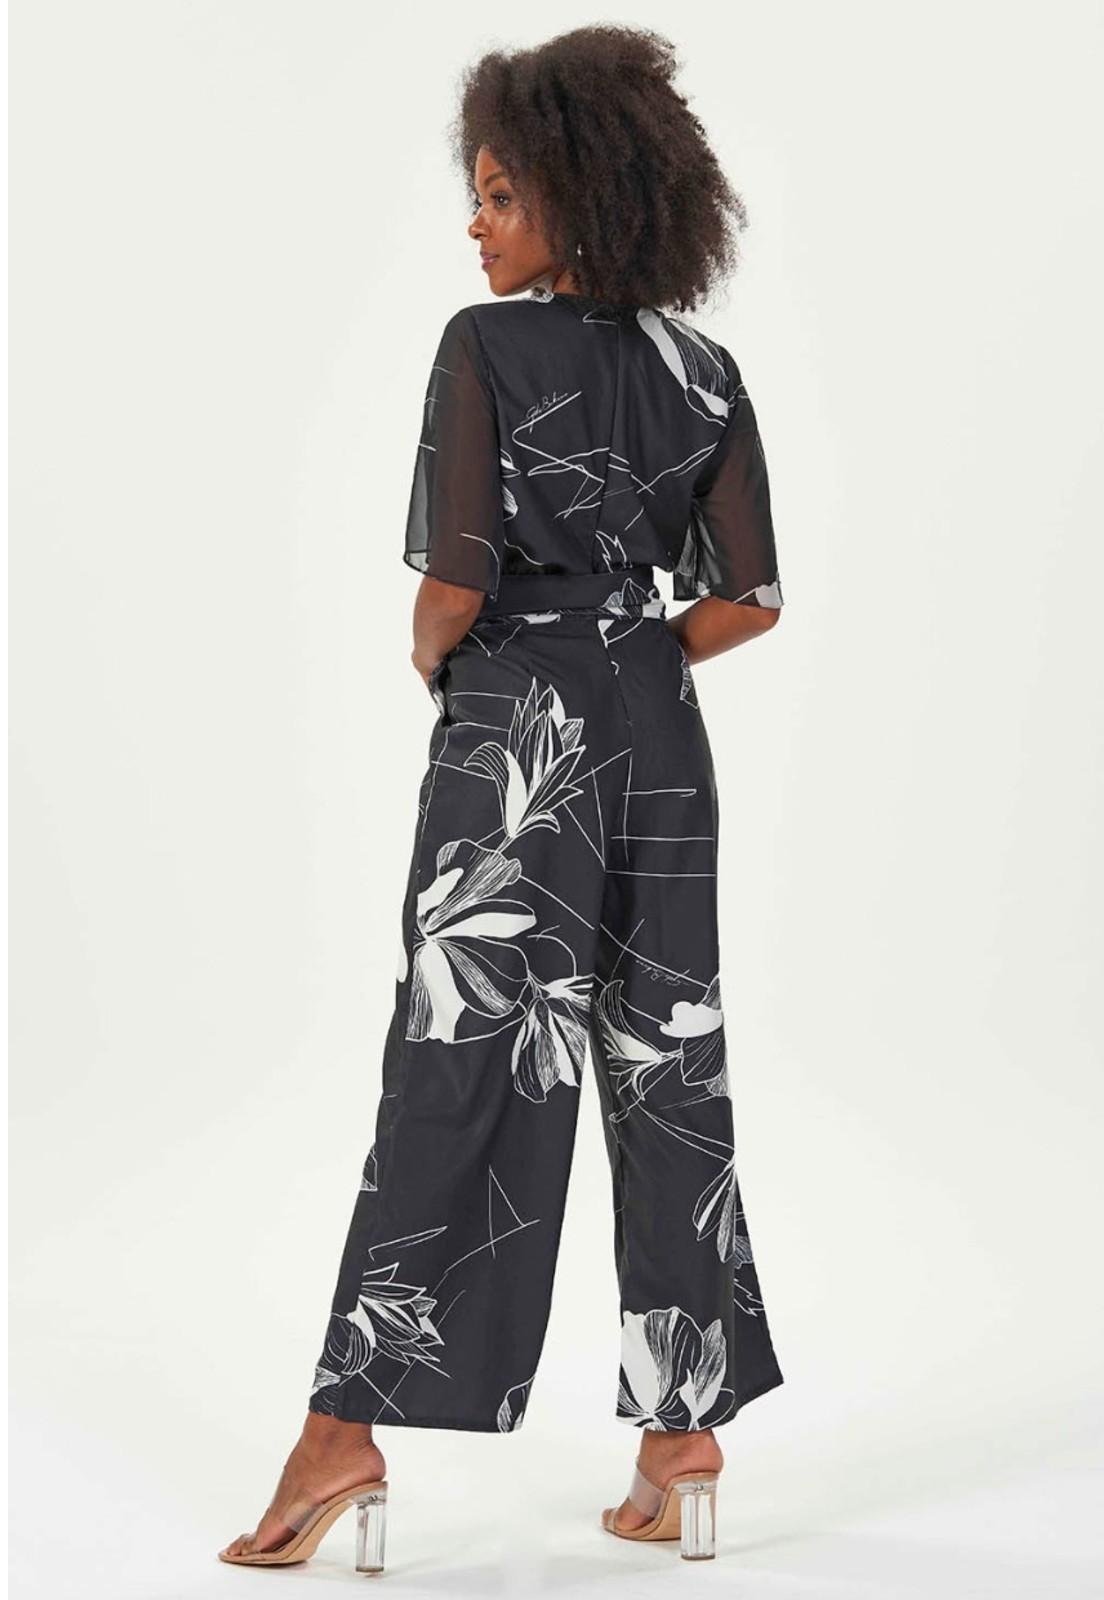 macacão pantalona preto e branco